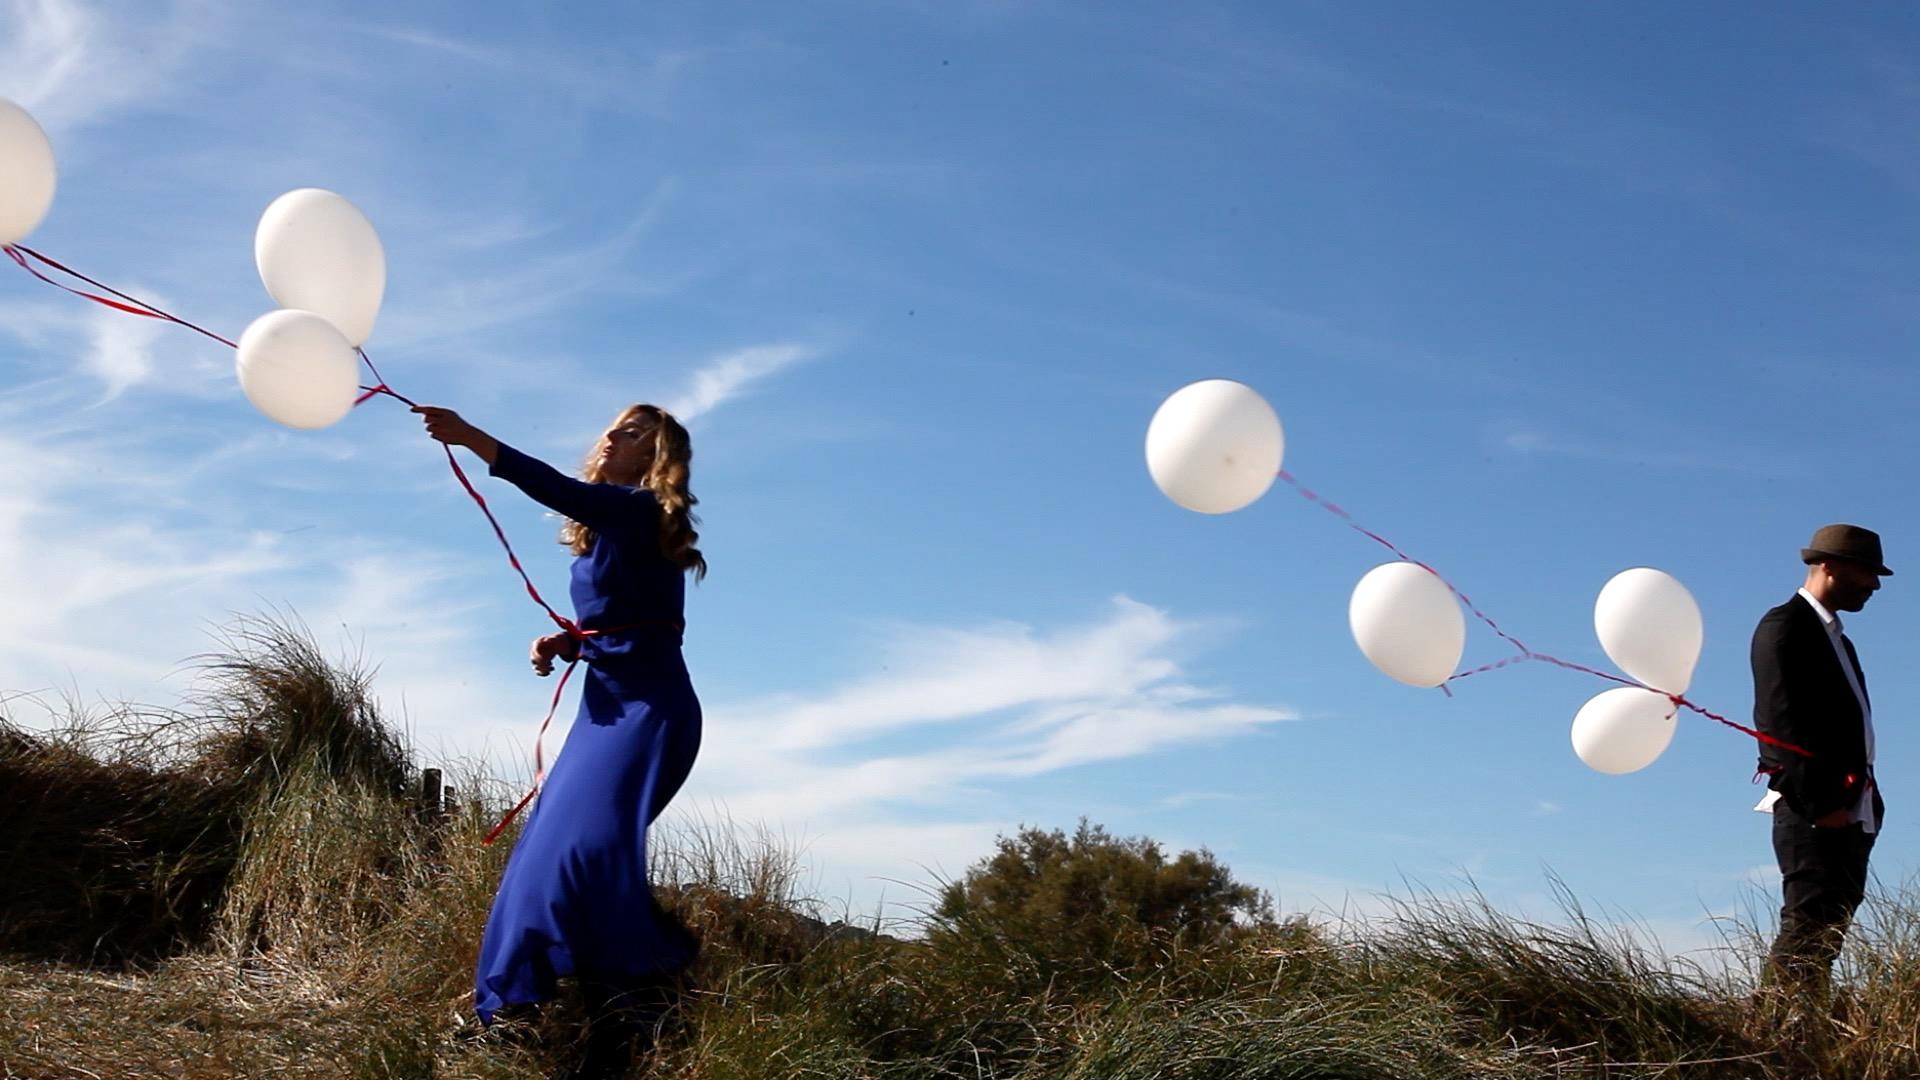 clip sunny day Music Video – Looking for Emma – Ned- Musique -Viviane Riberaigua Realisateur Director 5